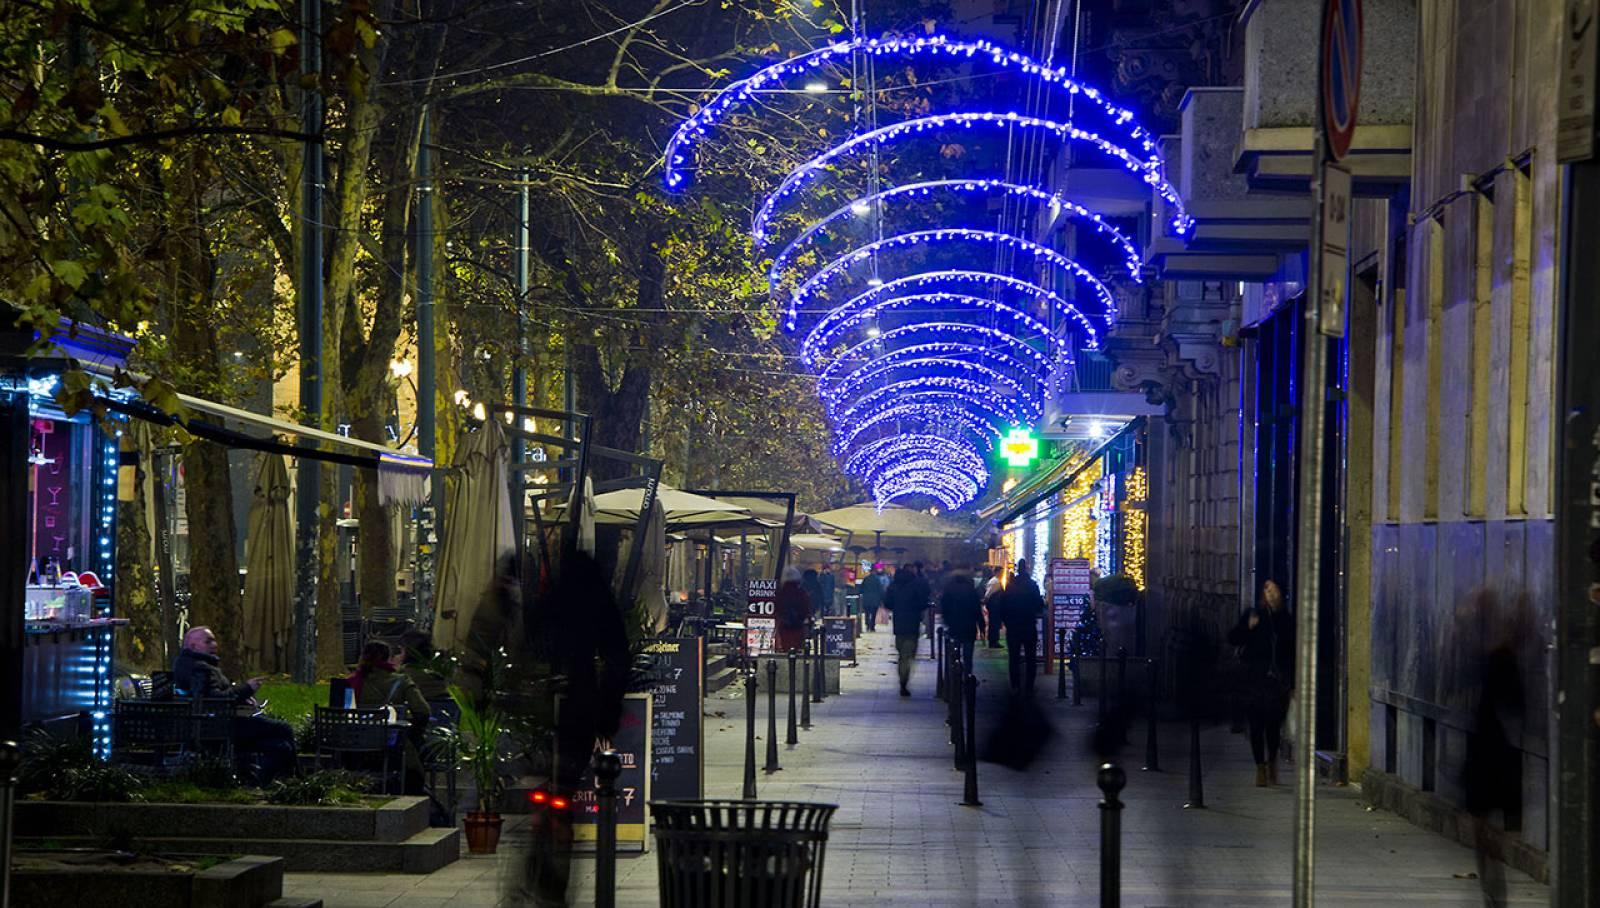 OOH Natale 2018 IGPDecaux illuminazione per Nexi